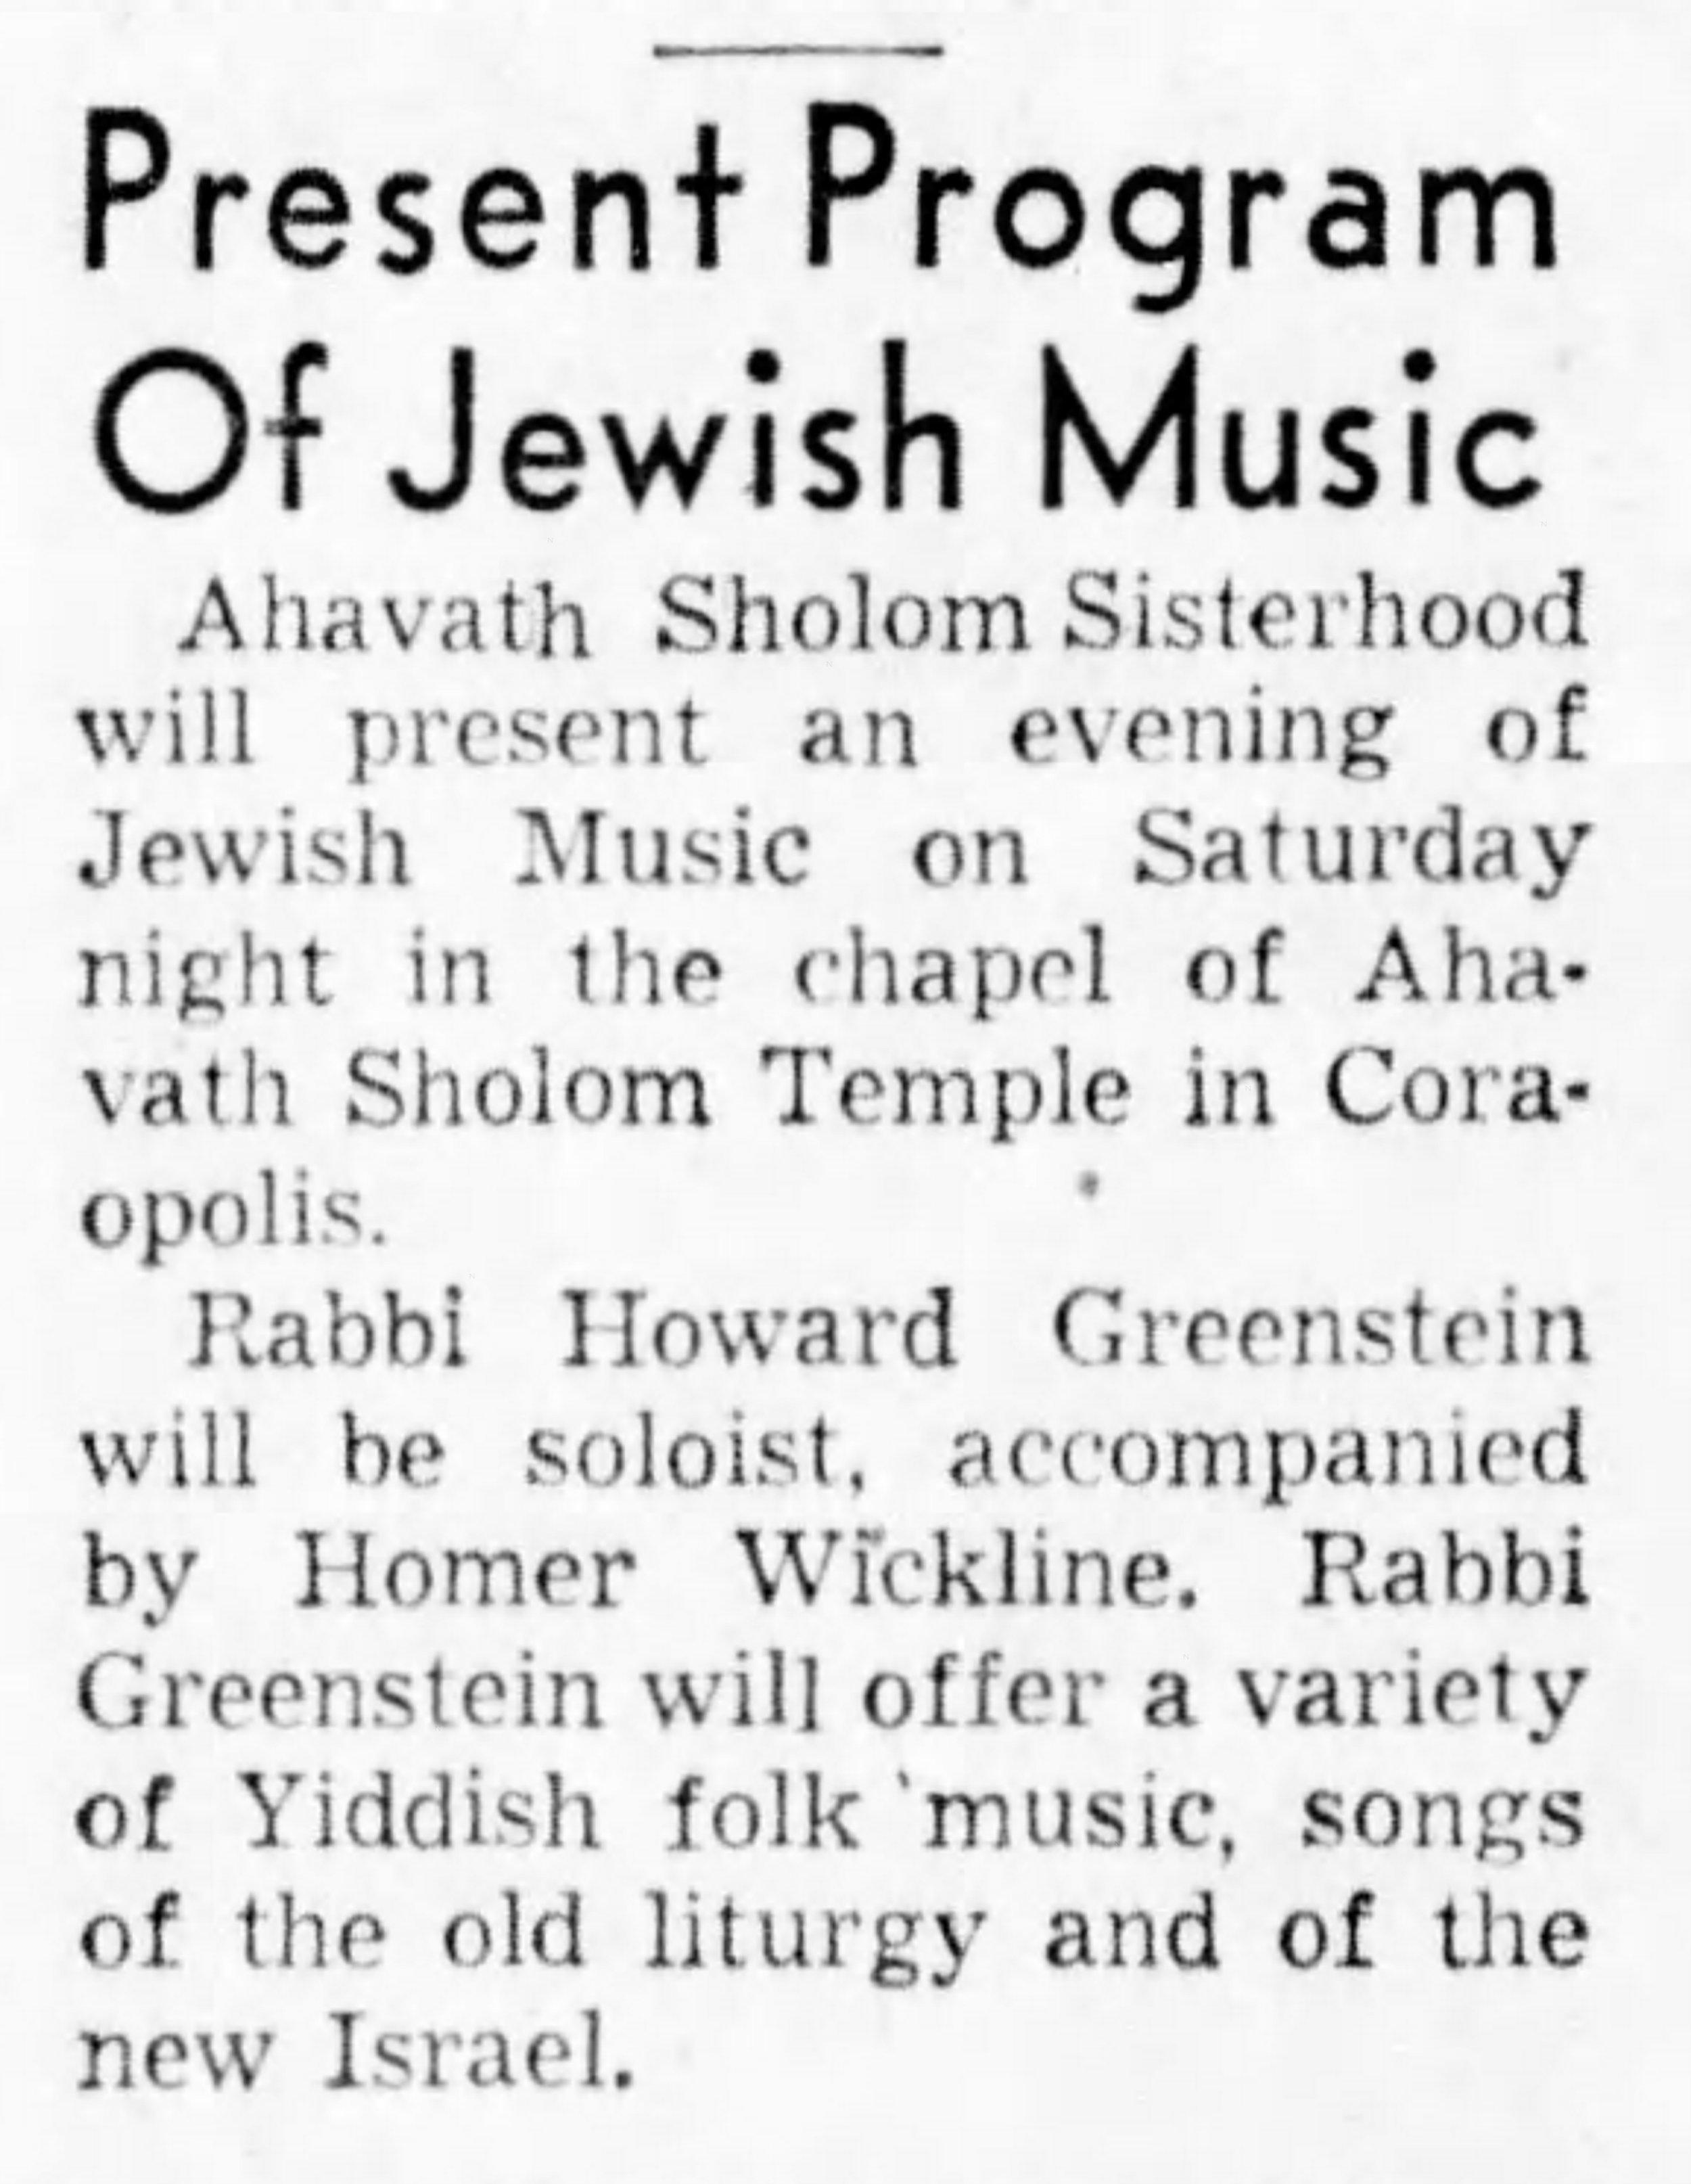 1961-05-03 Pittsburgh Post-Gazette (v34, n276, p15)